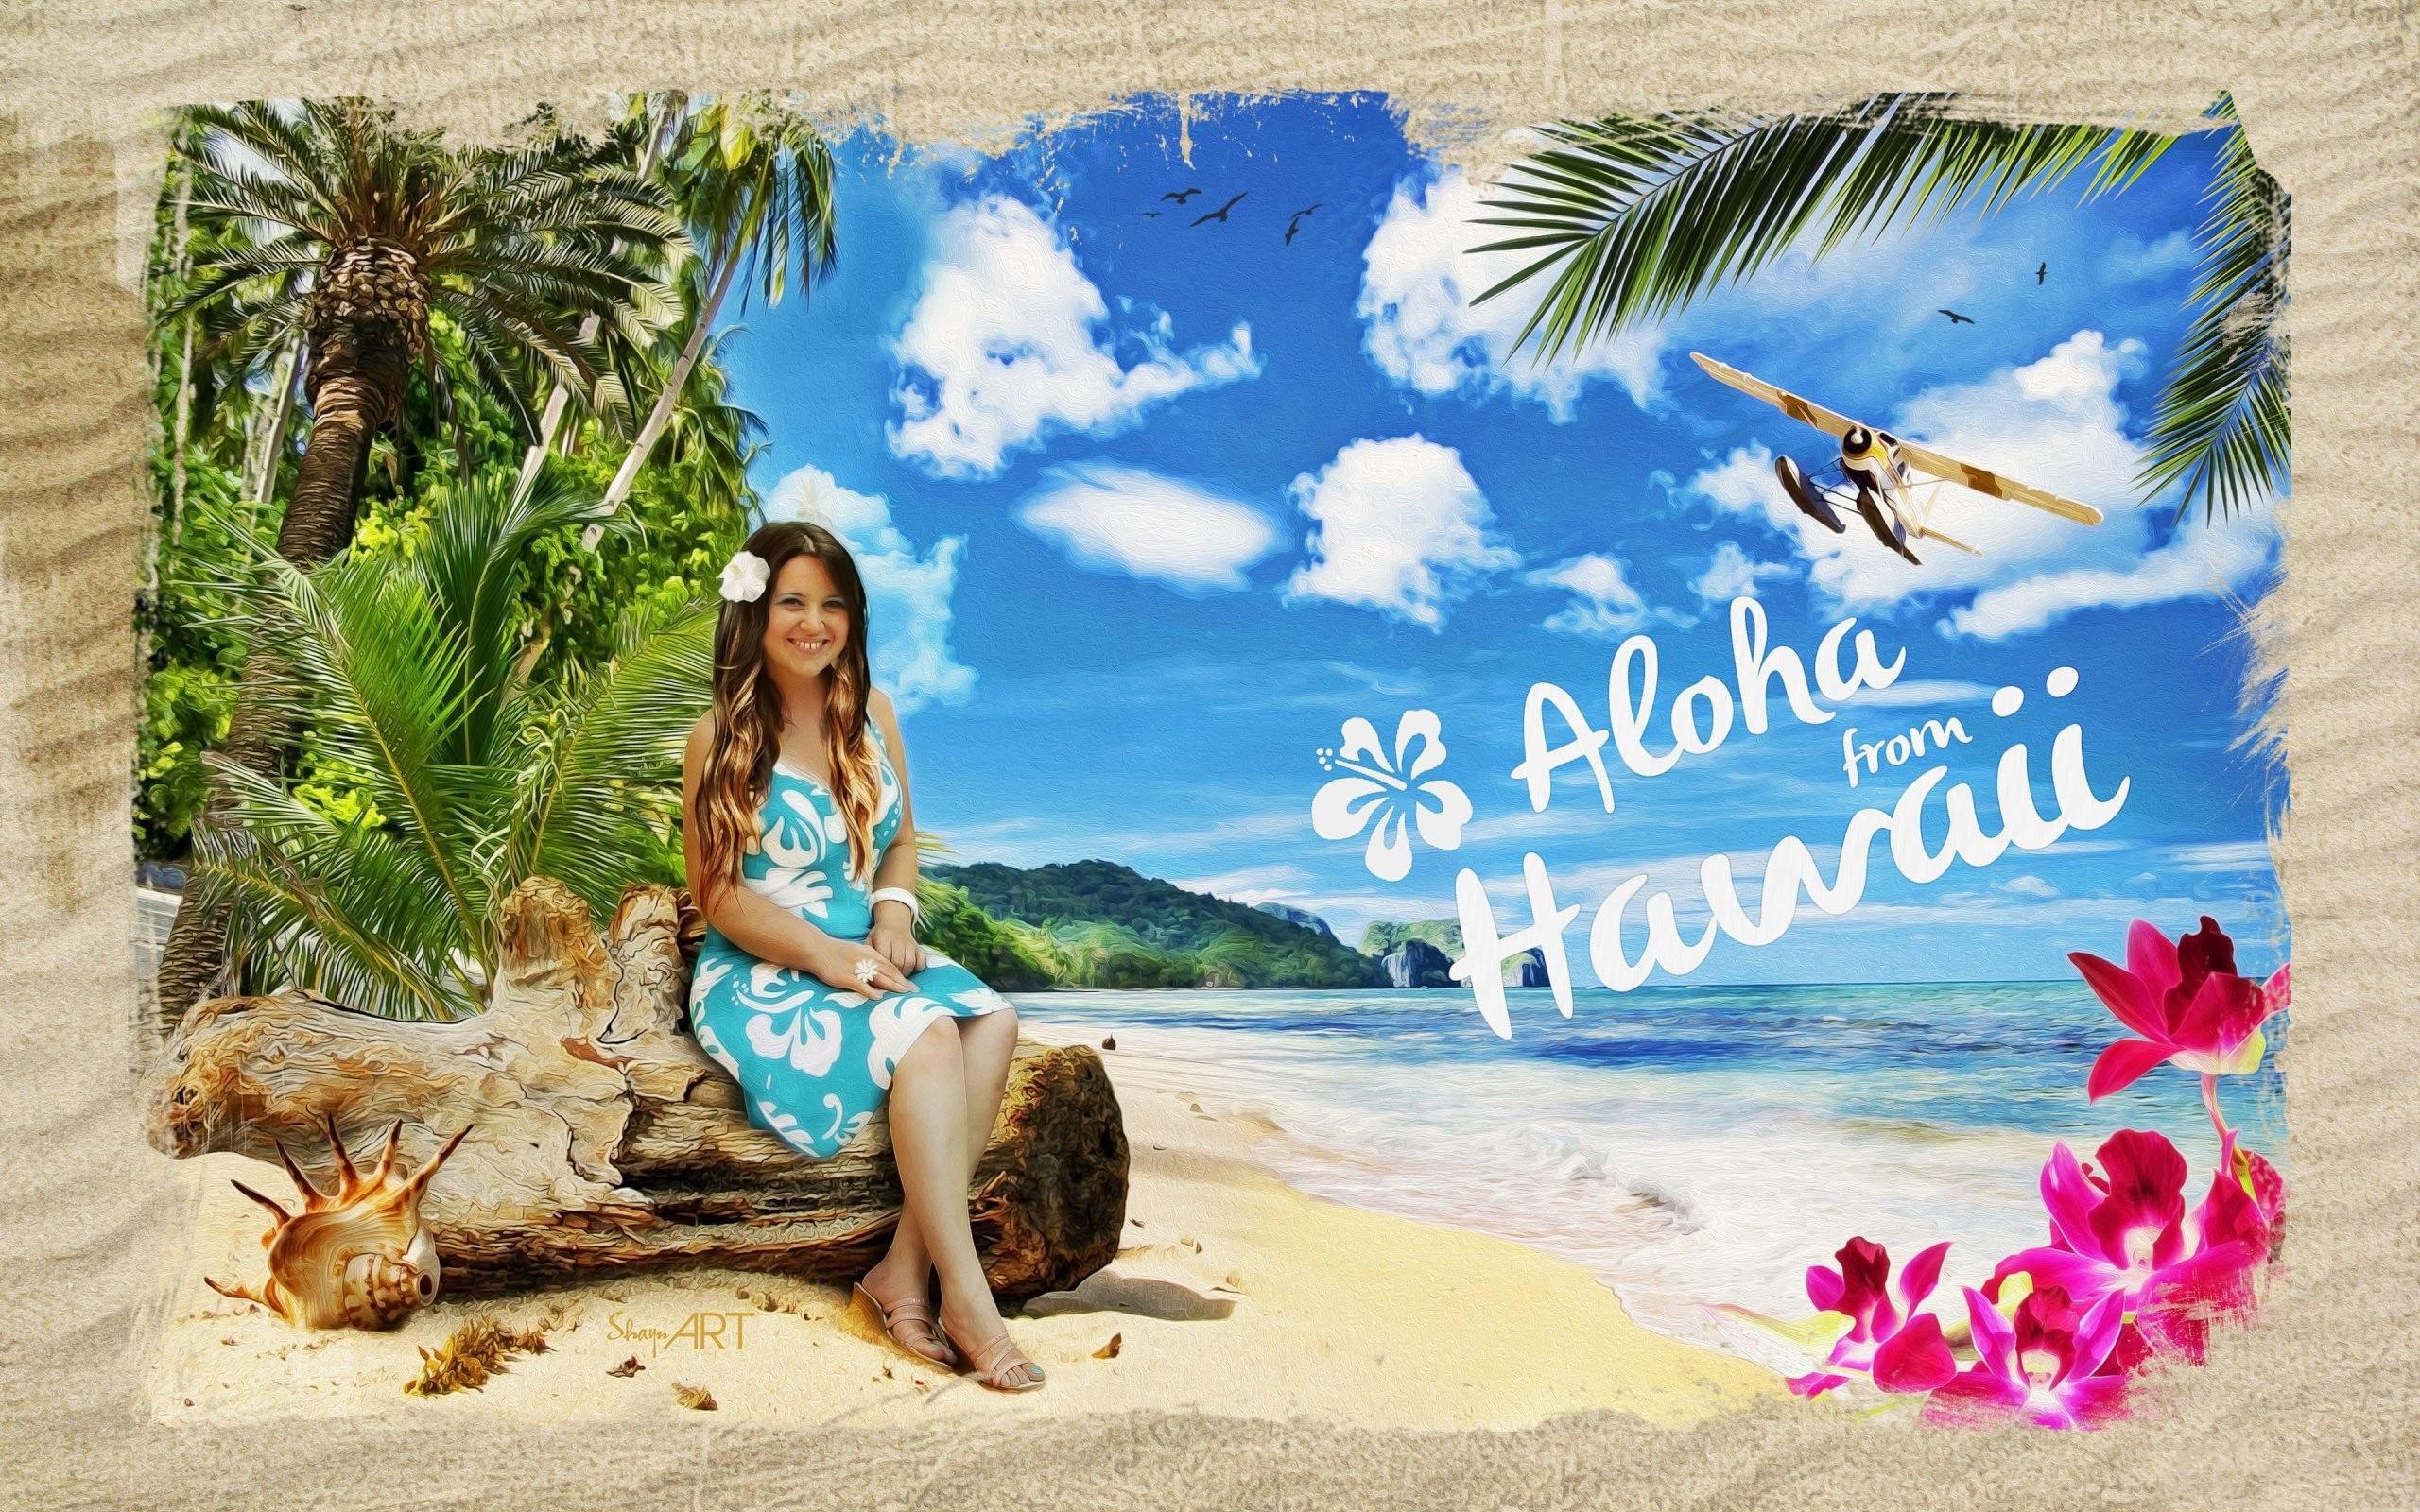 4K HD Wallpaper 2: Graphic Design – Aloha from Hawaii